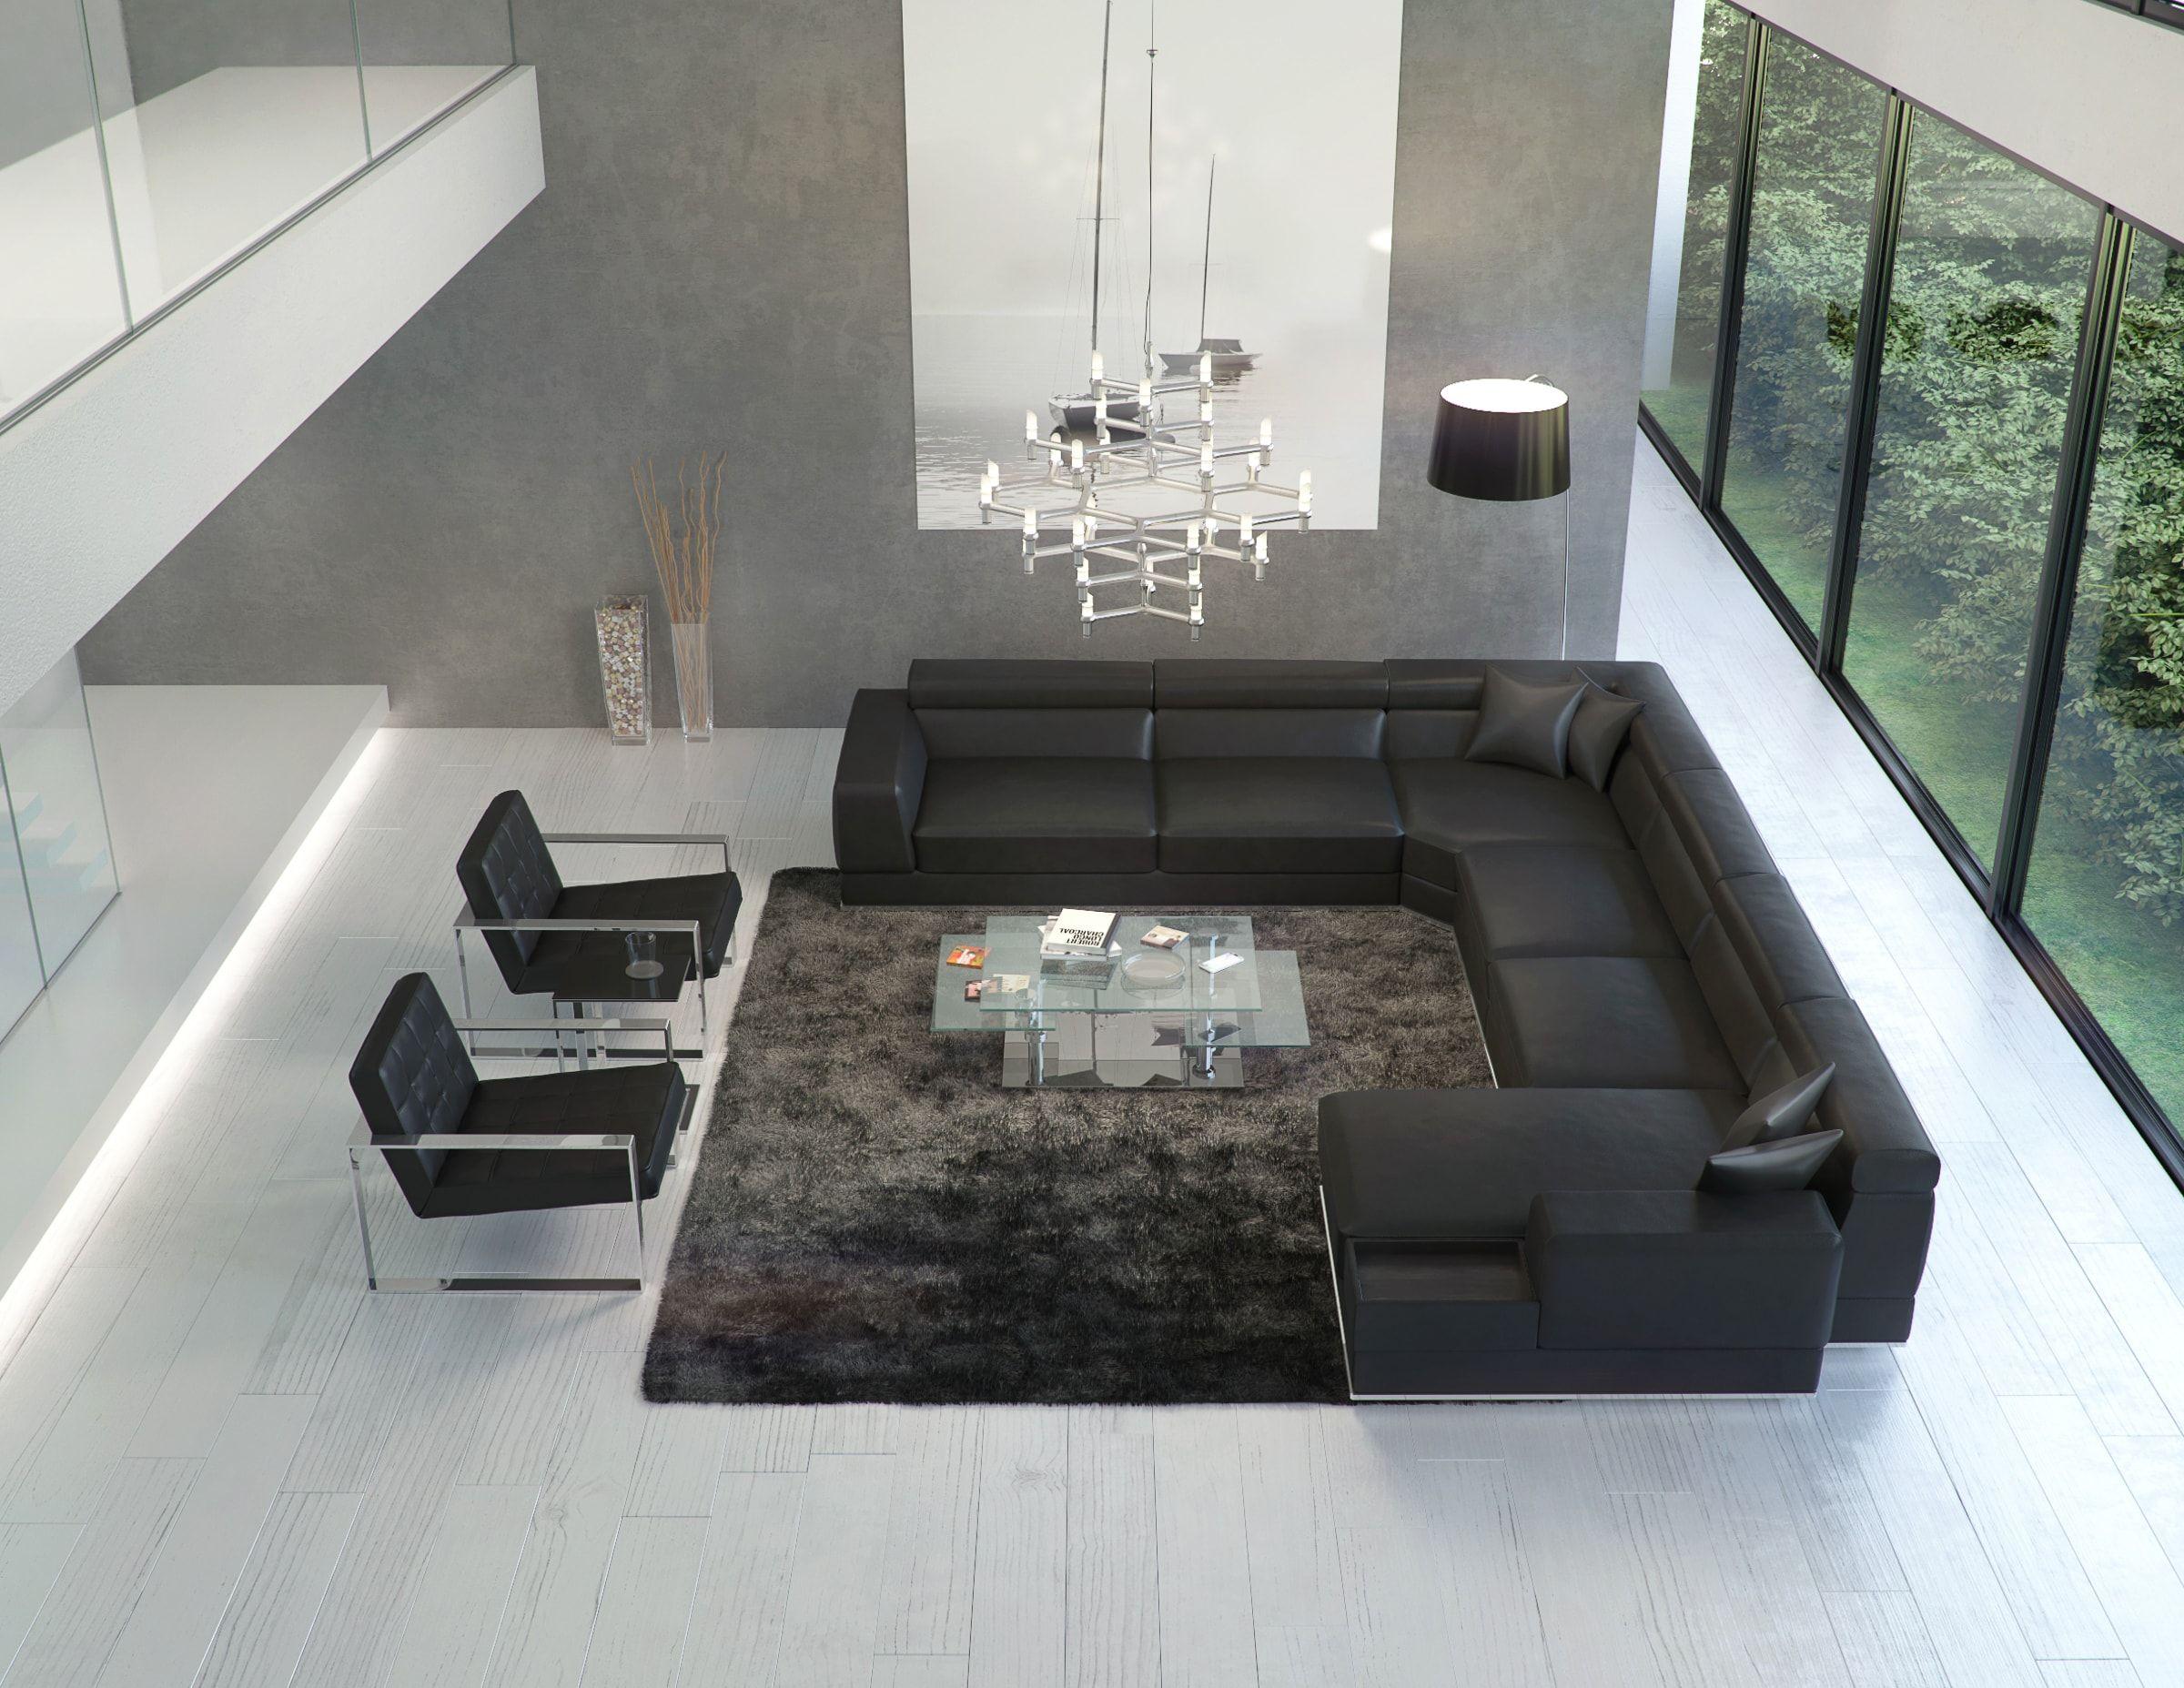 Outstanding Bergamo Extended Sectional Leather Modern Sofa Black House Evergreenethics Interior Chair Design Evergreenethicsorg